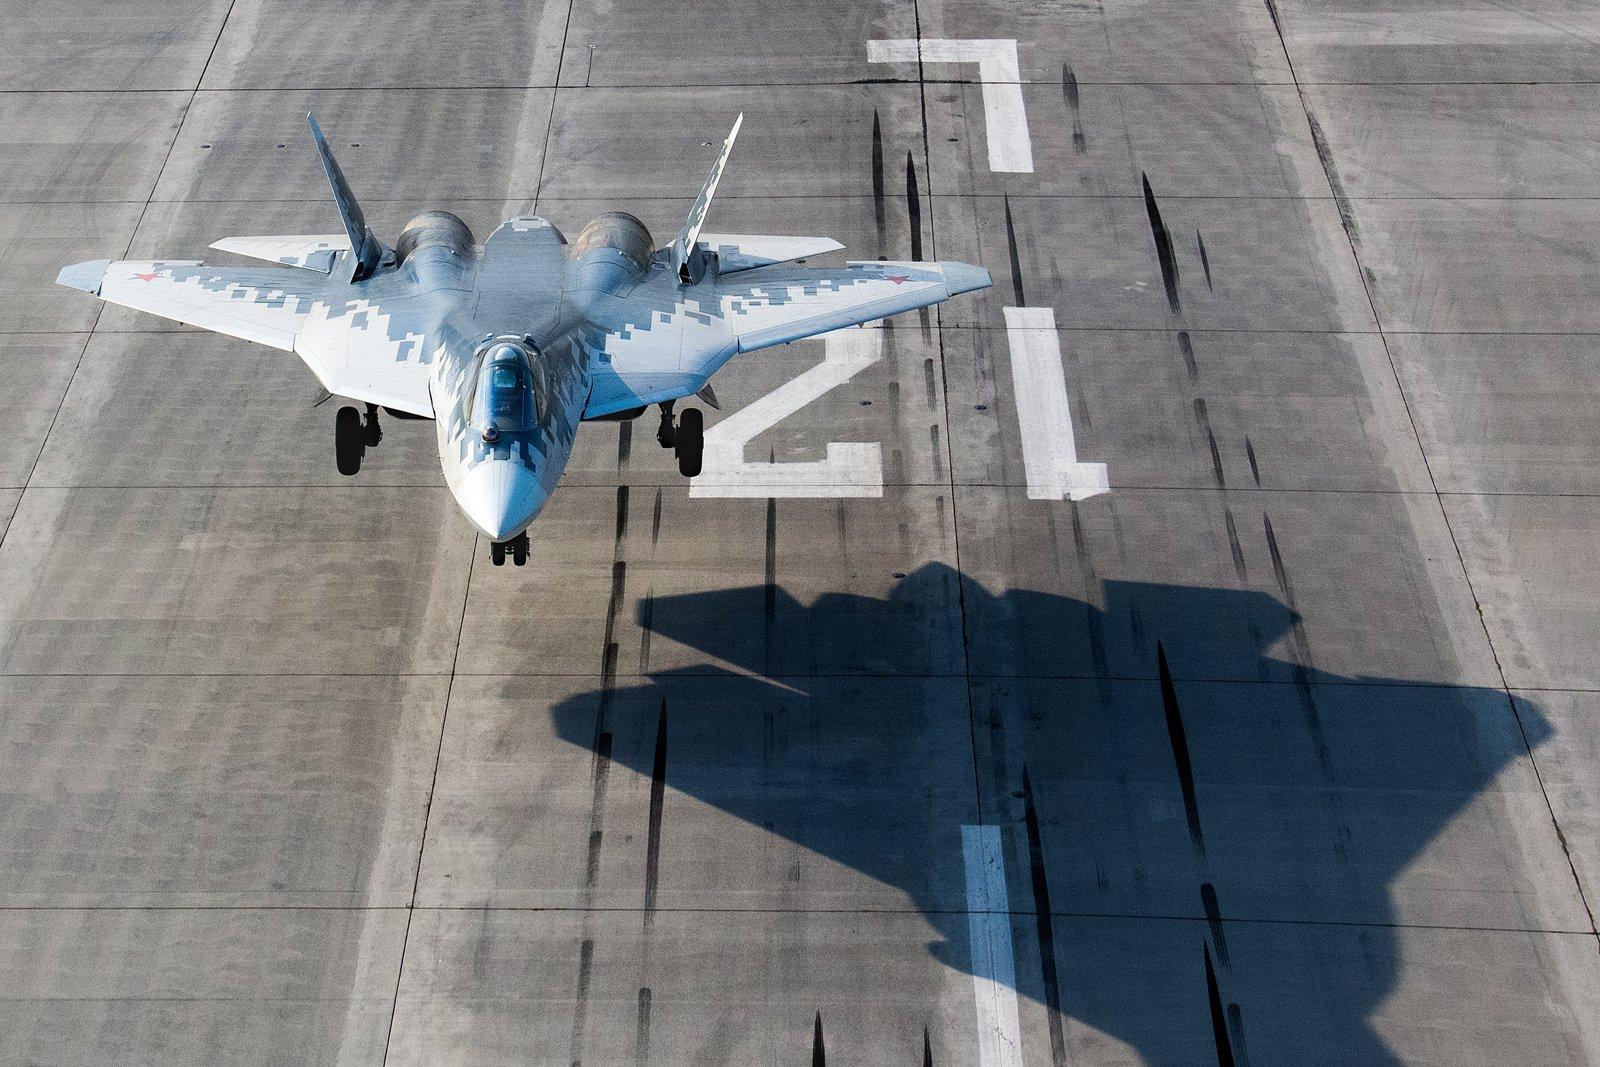 مقاتله Sukhoi T-50 PAK FA سيتغير اسمها الى Su-57  - صفحة 7 EVALVlEUwAAHryg?format=jpg&name=large